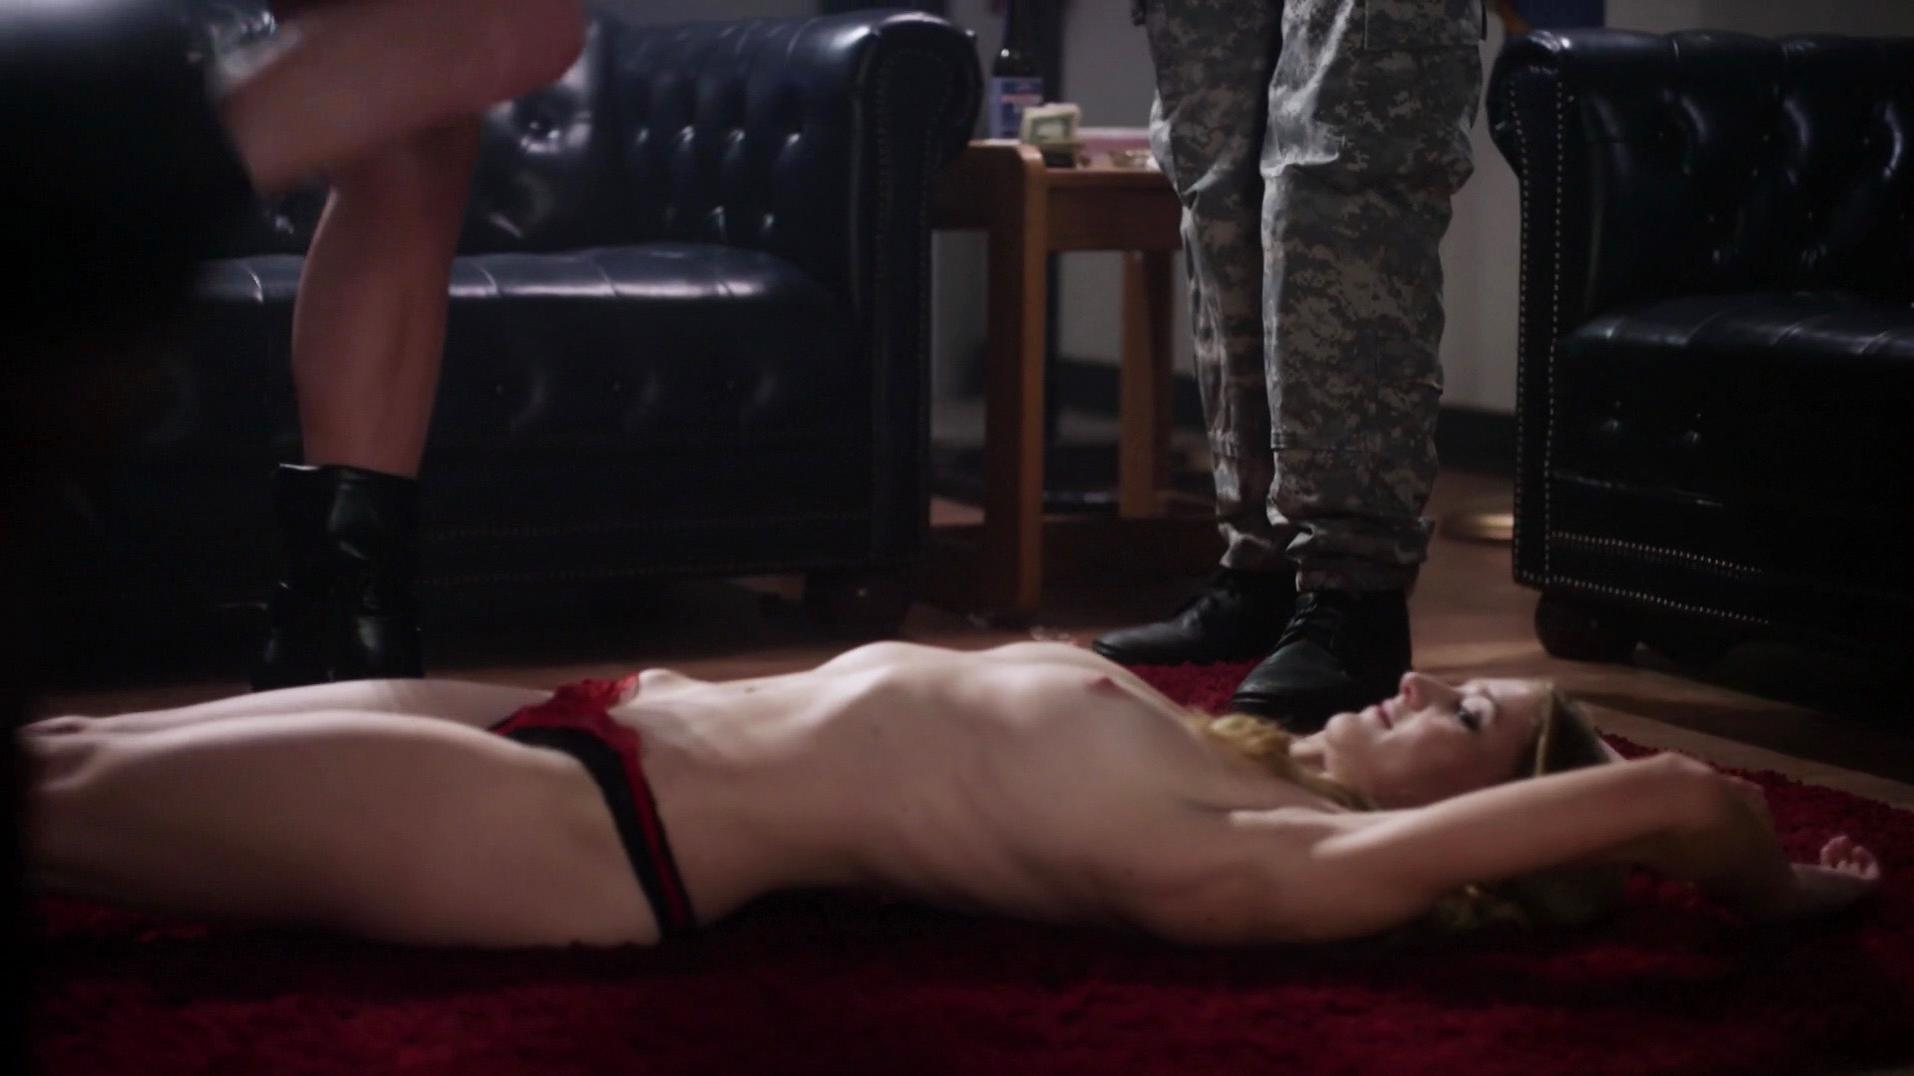 Winter Ave Zoli nude, Maria Rogers nude - Cat Run 2 (2014)